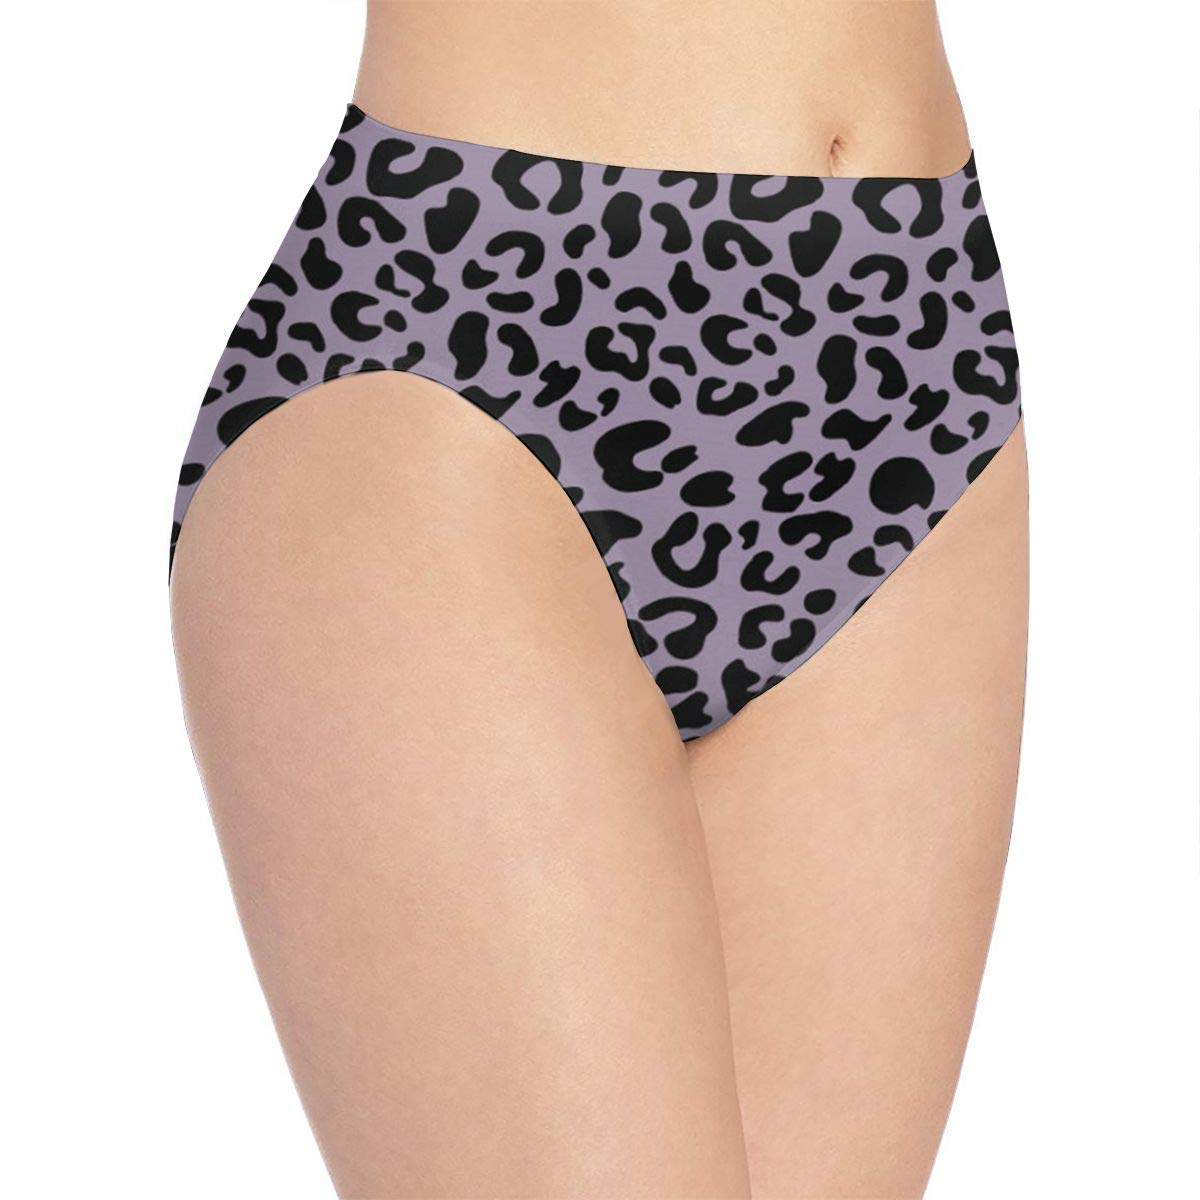 c01b8d033 Purple Leopard Print Women s Underwear Hipster Panties at Amazon Women s  Clothing store